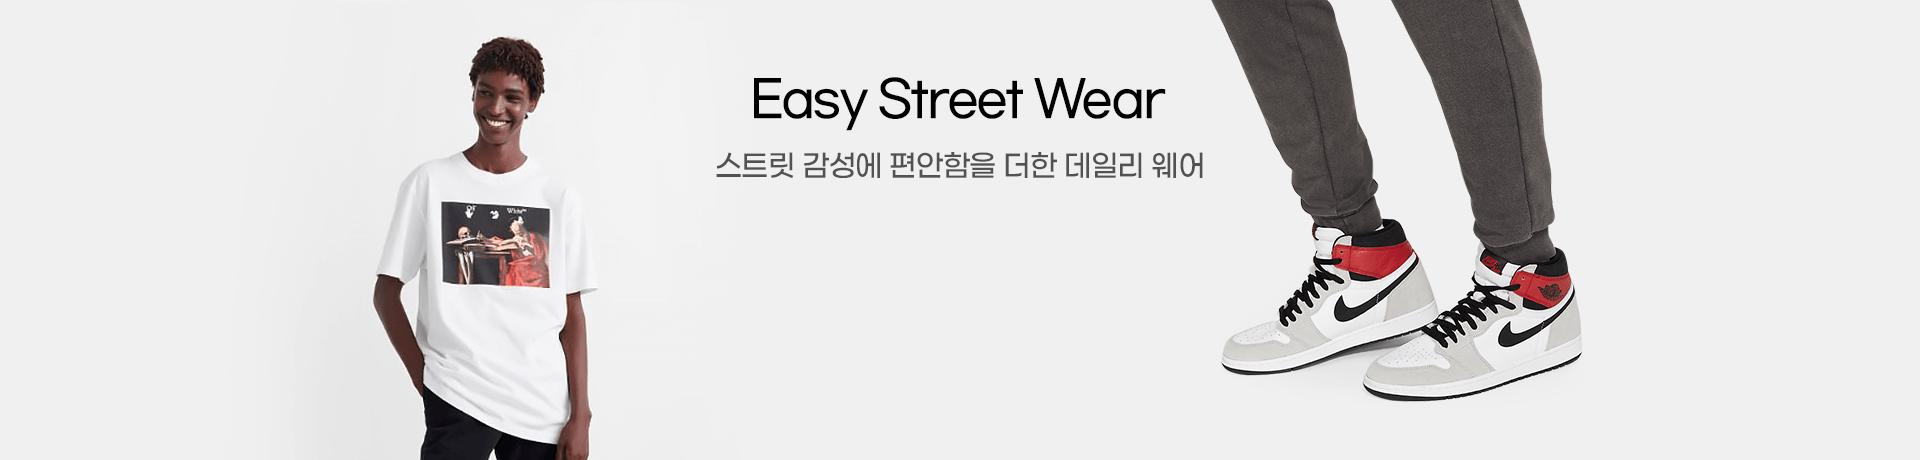 210719_sk_easy-street-wear_pc_f0f0f0